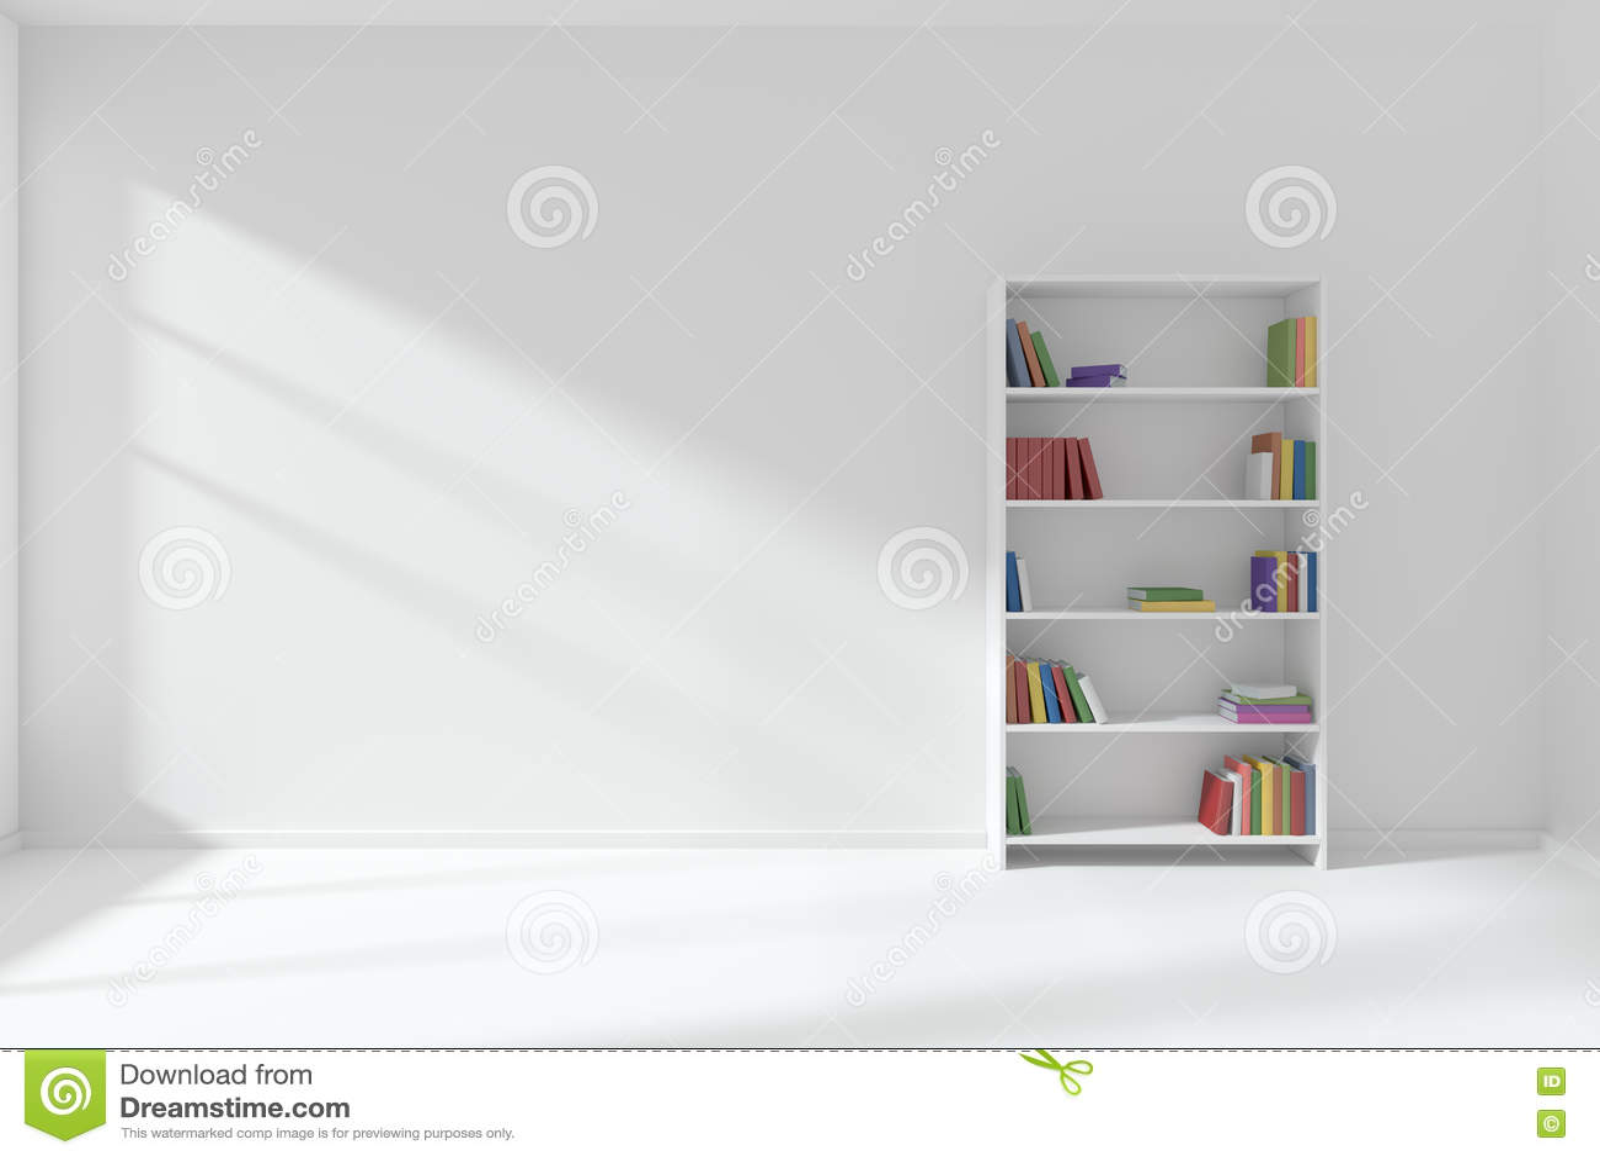 Empty white room with bookcase minimalist interior